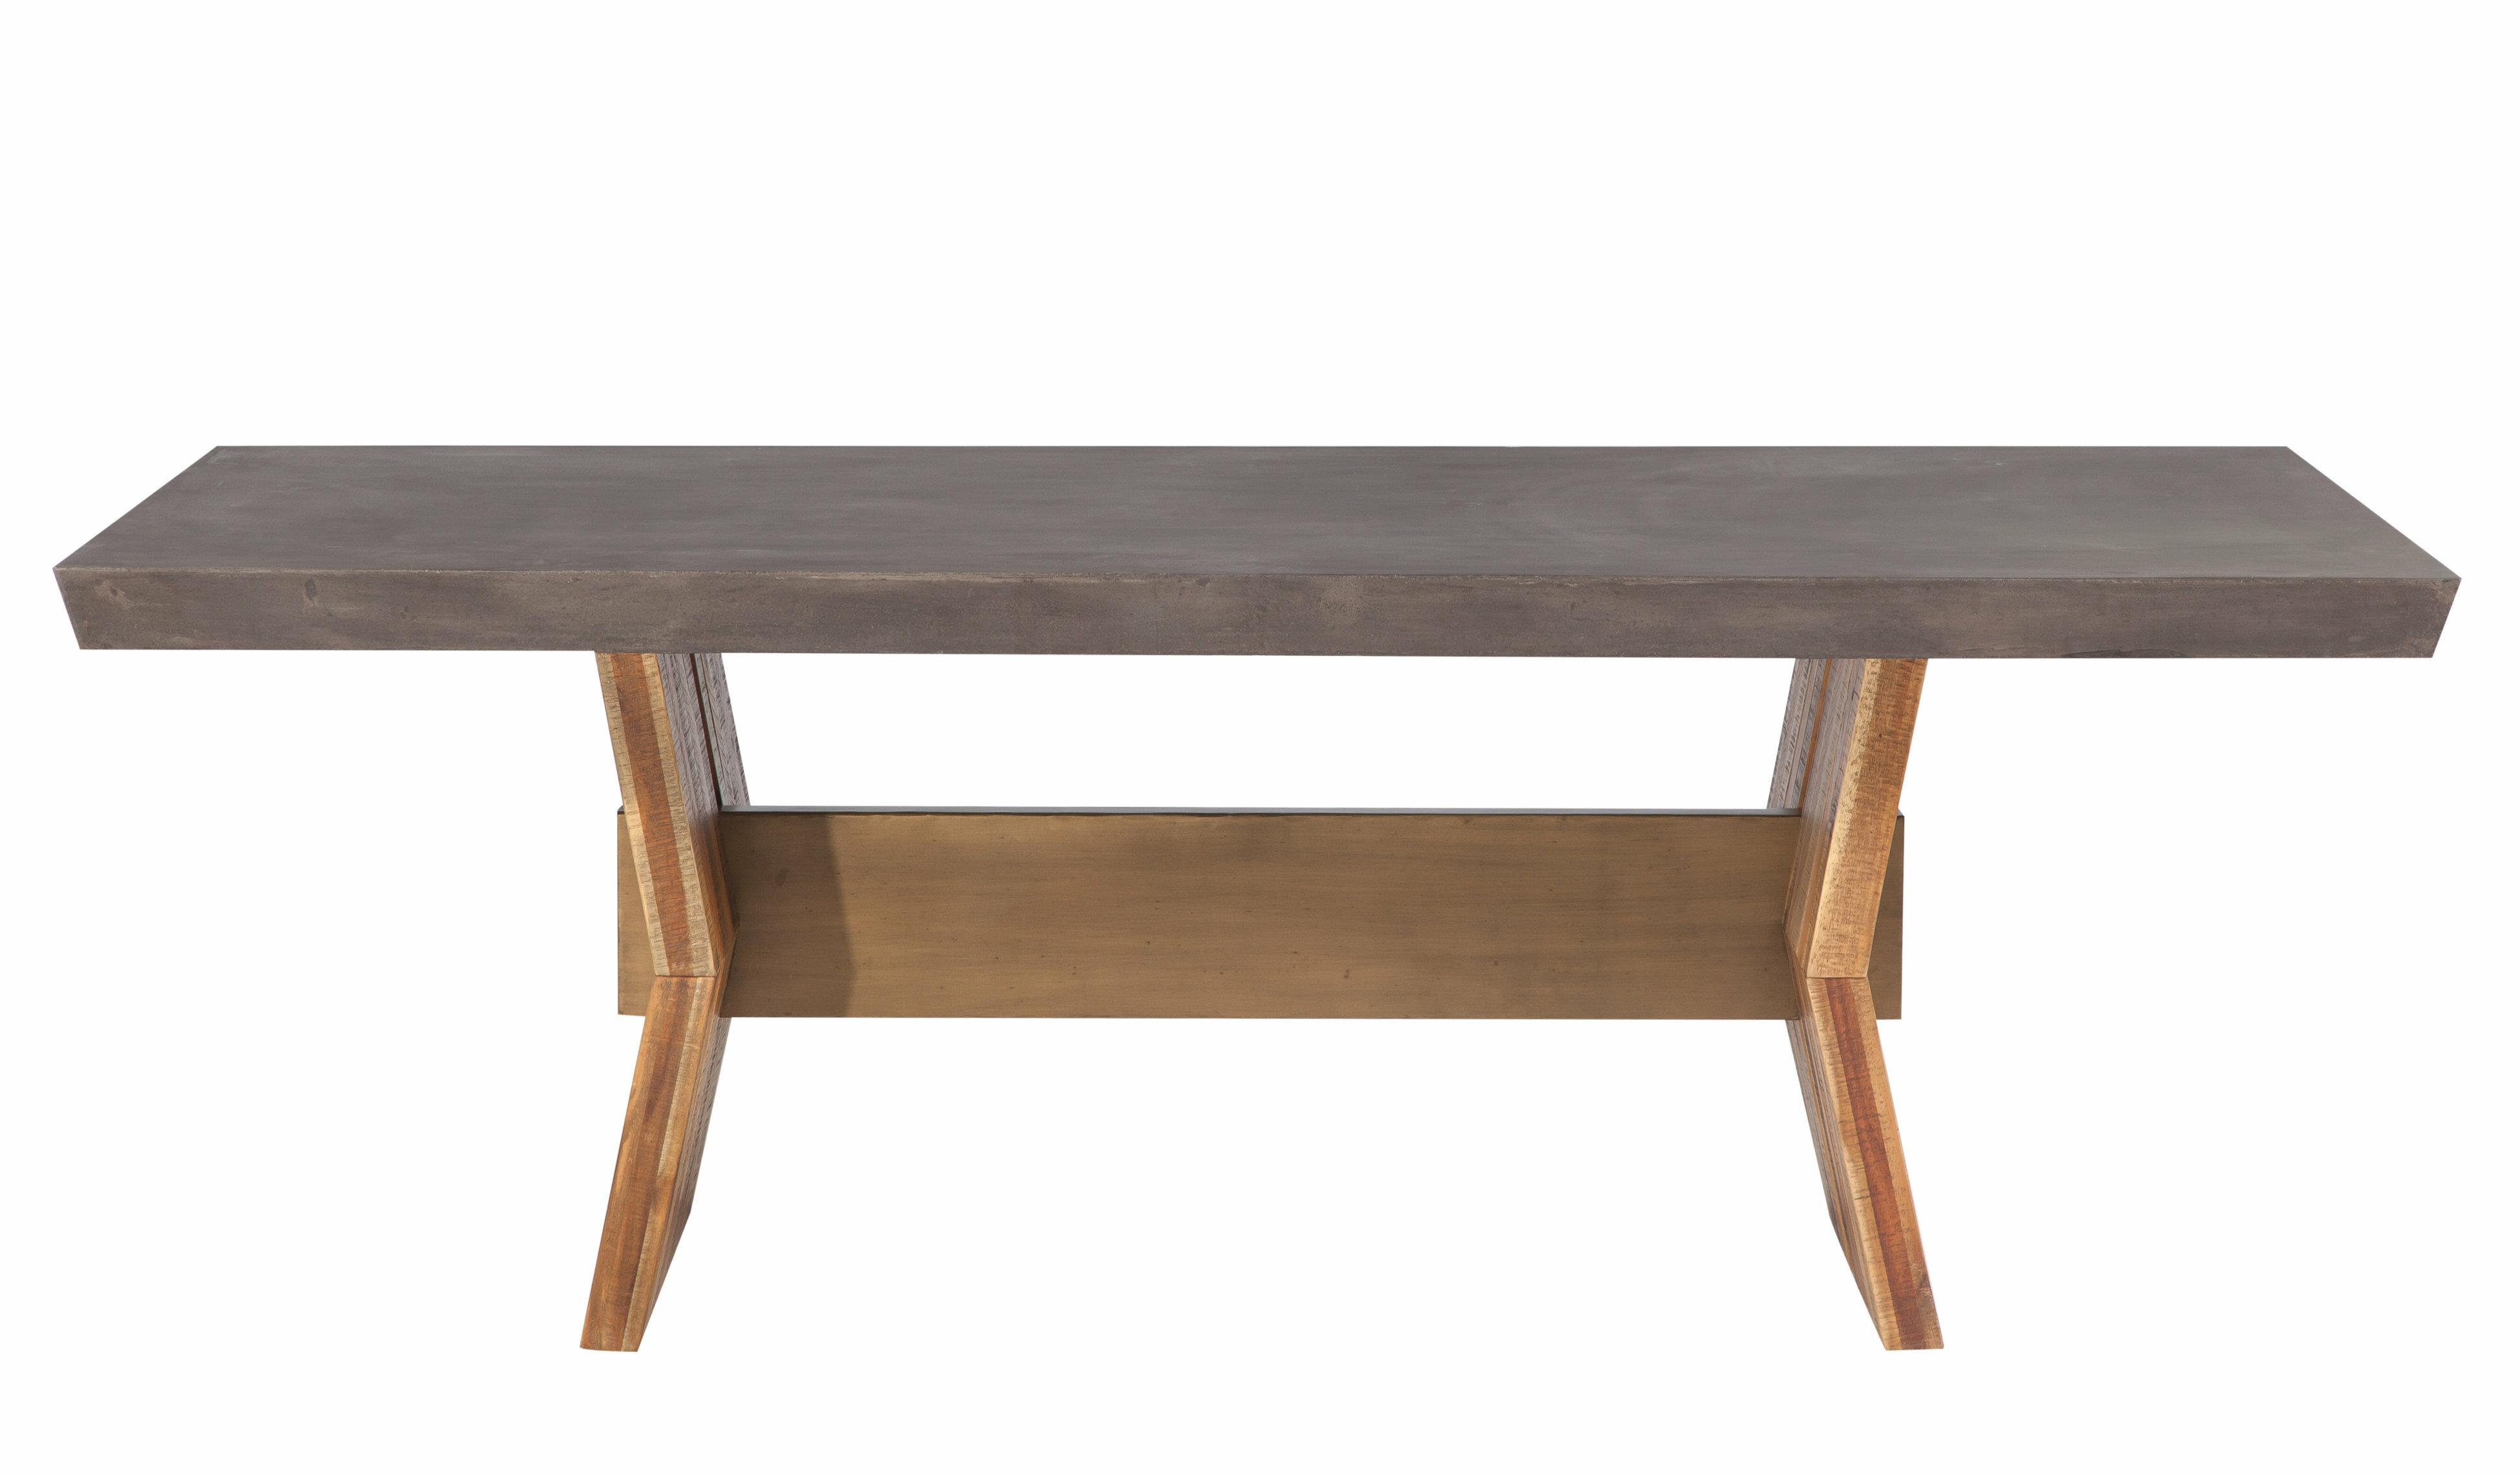 Brayden studio dusek concrete dining table wayfair